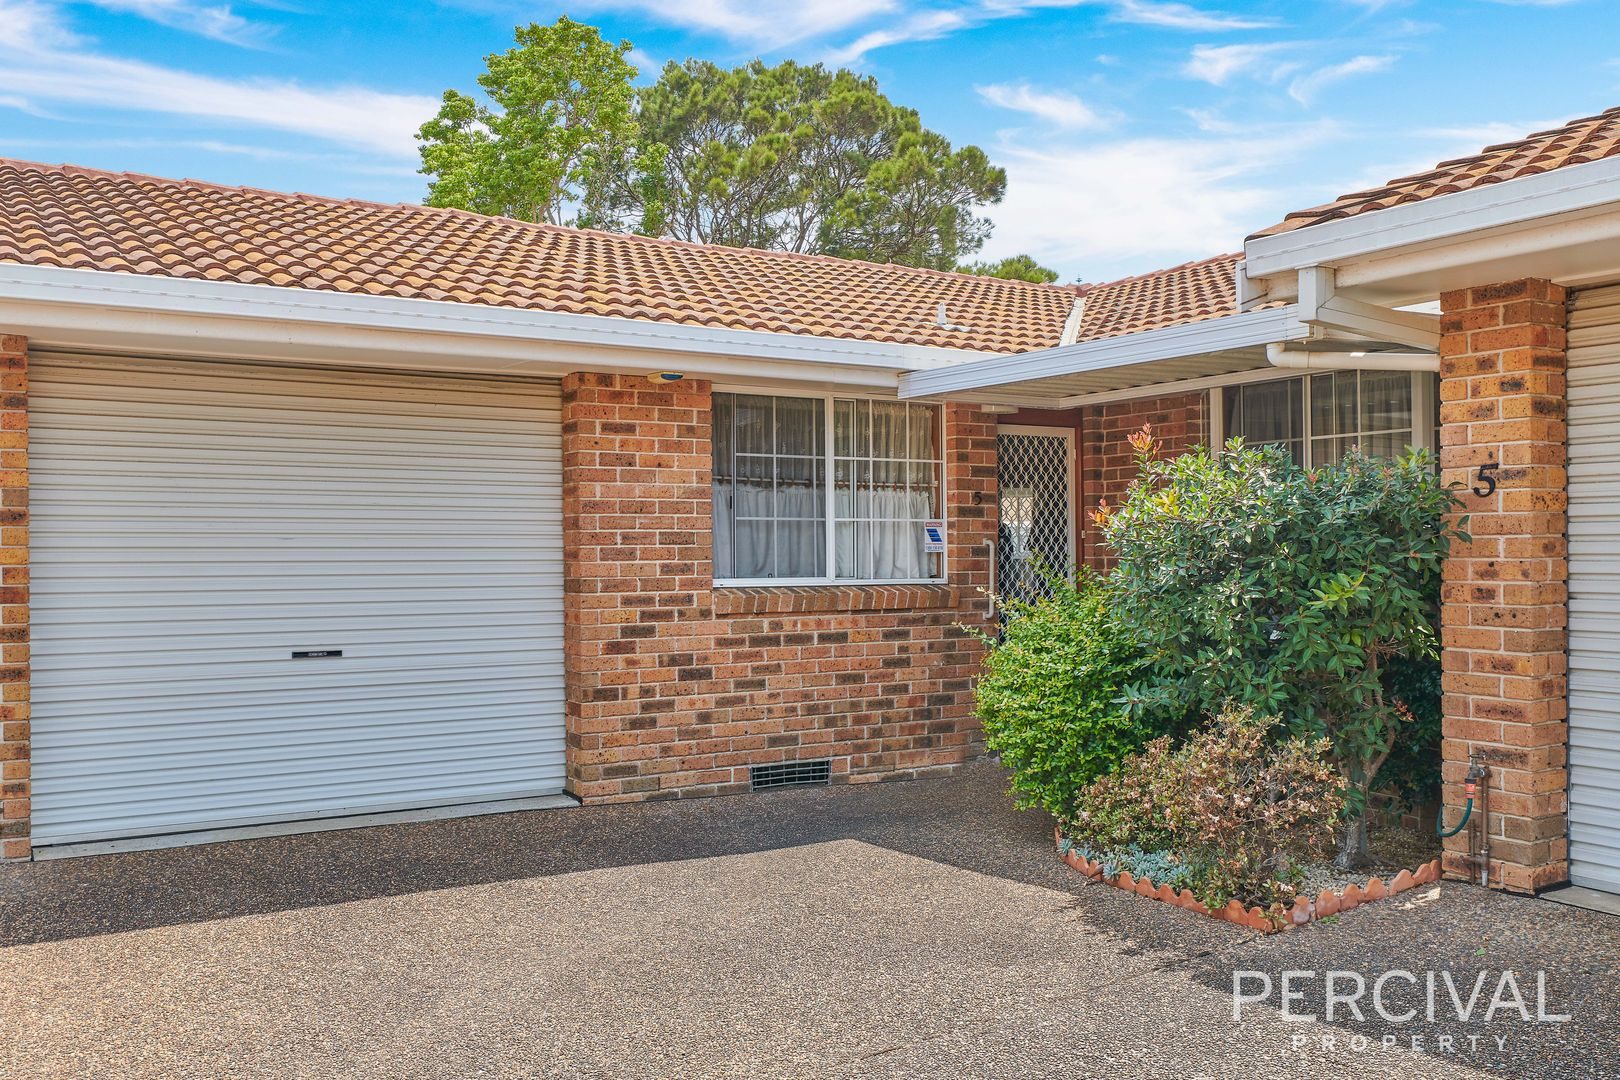 5/5-7 Ackroyd Street, Port Macquarie NSW 2444, Image 0